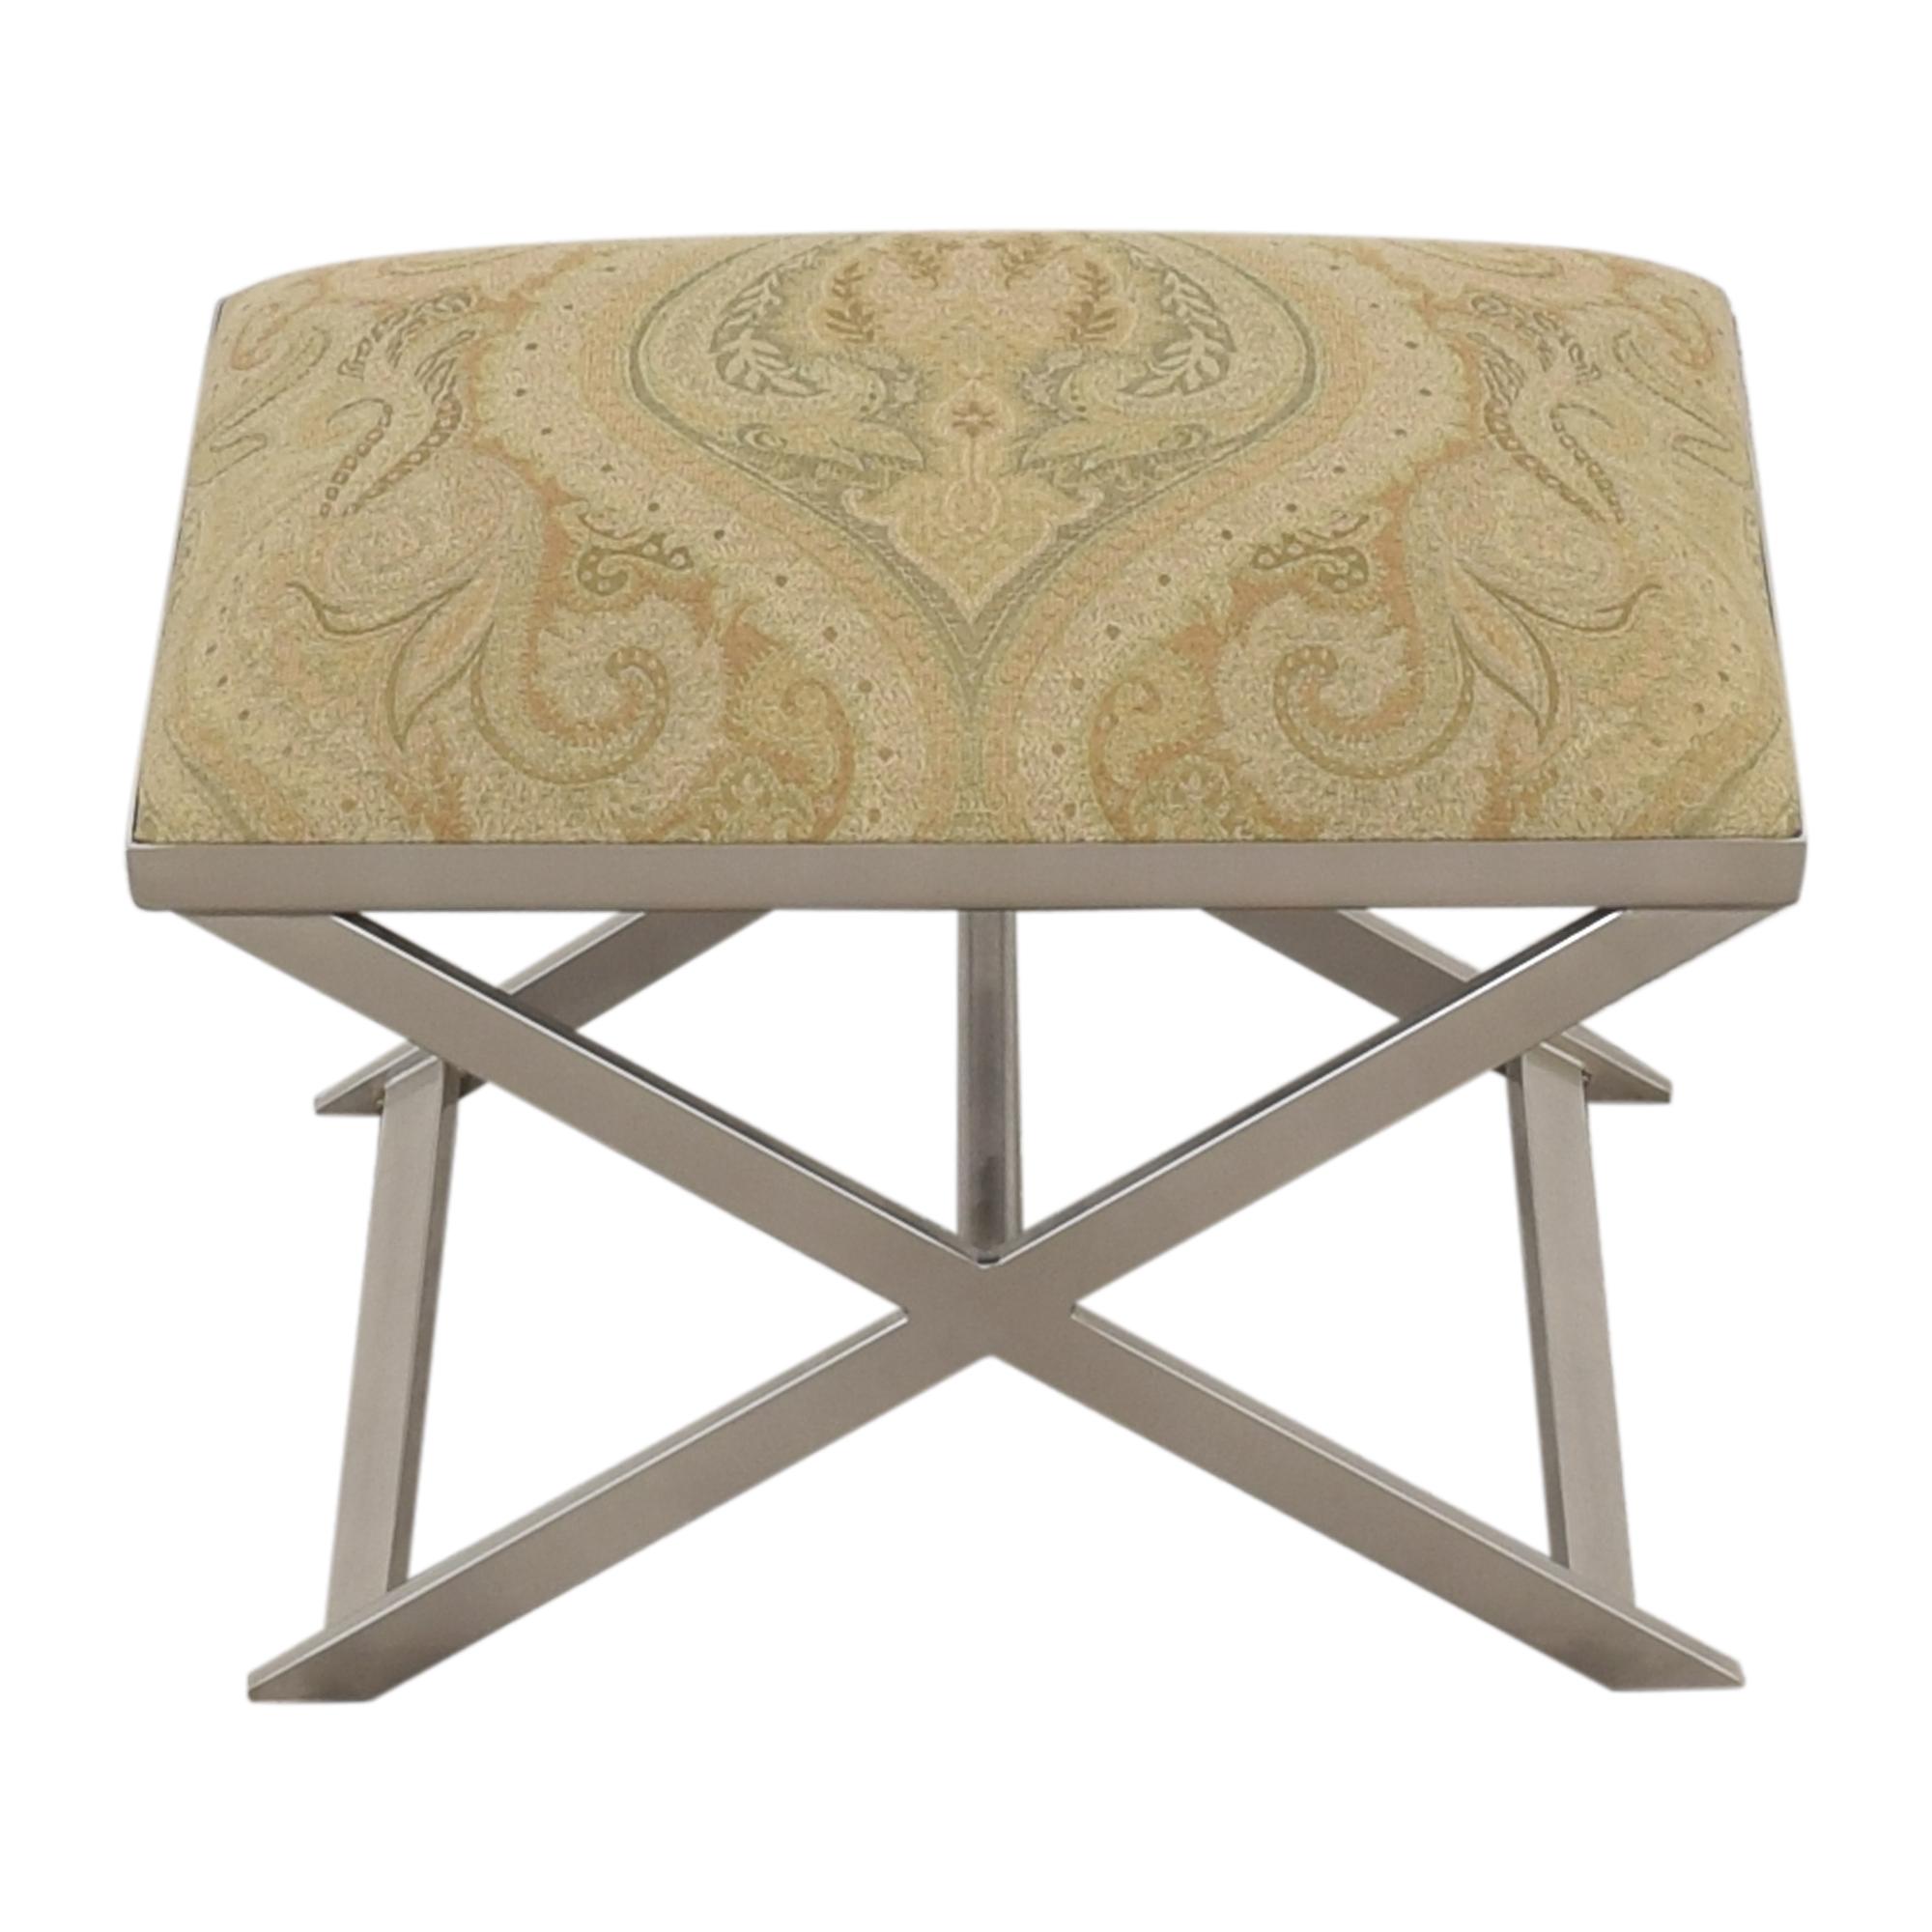 Ethan Allen Ethan Allen Xanadu Bench Chairs